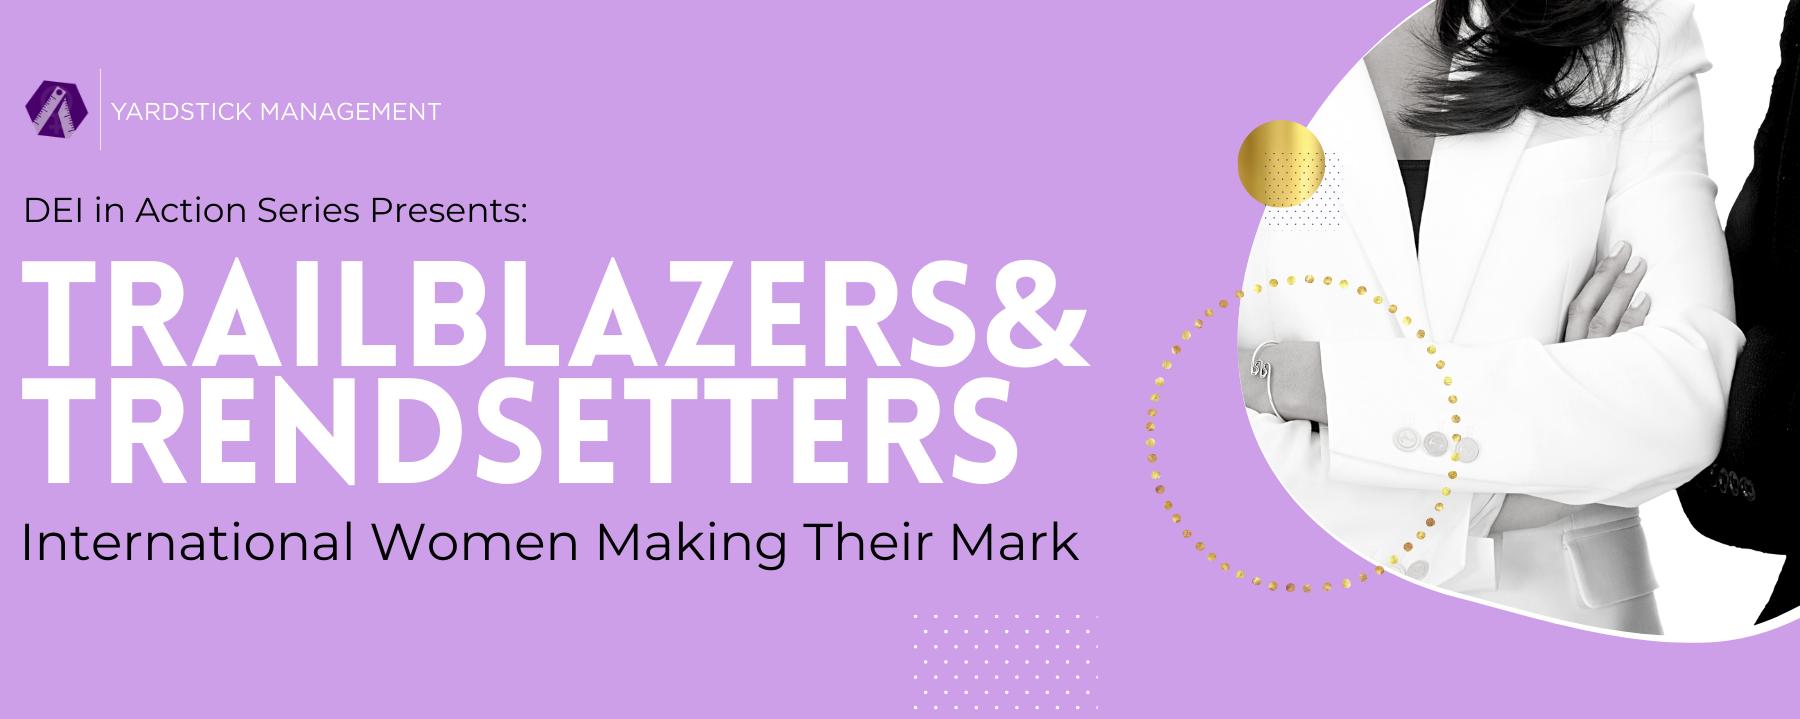 Trailblazers and Trendsetters: International Women Making Their Mark